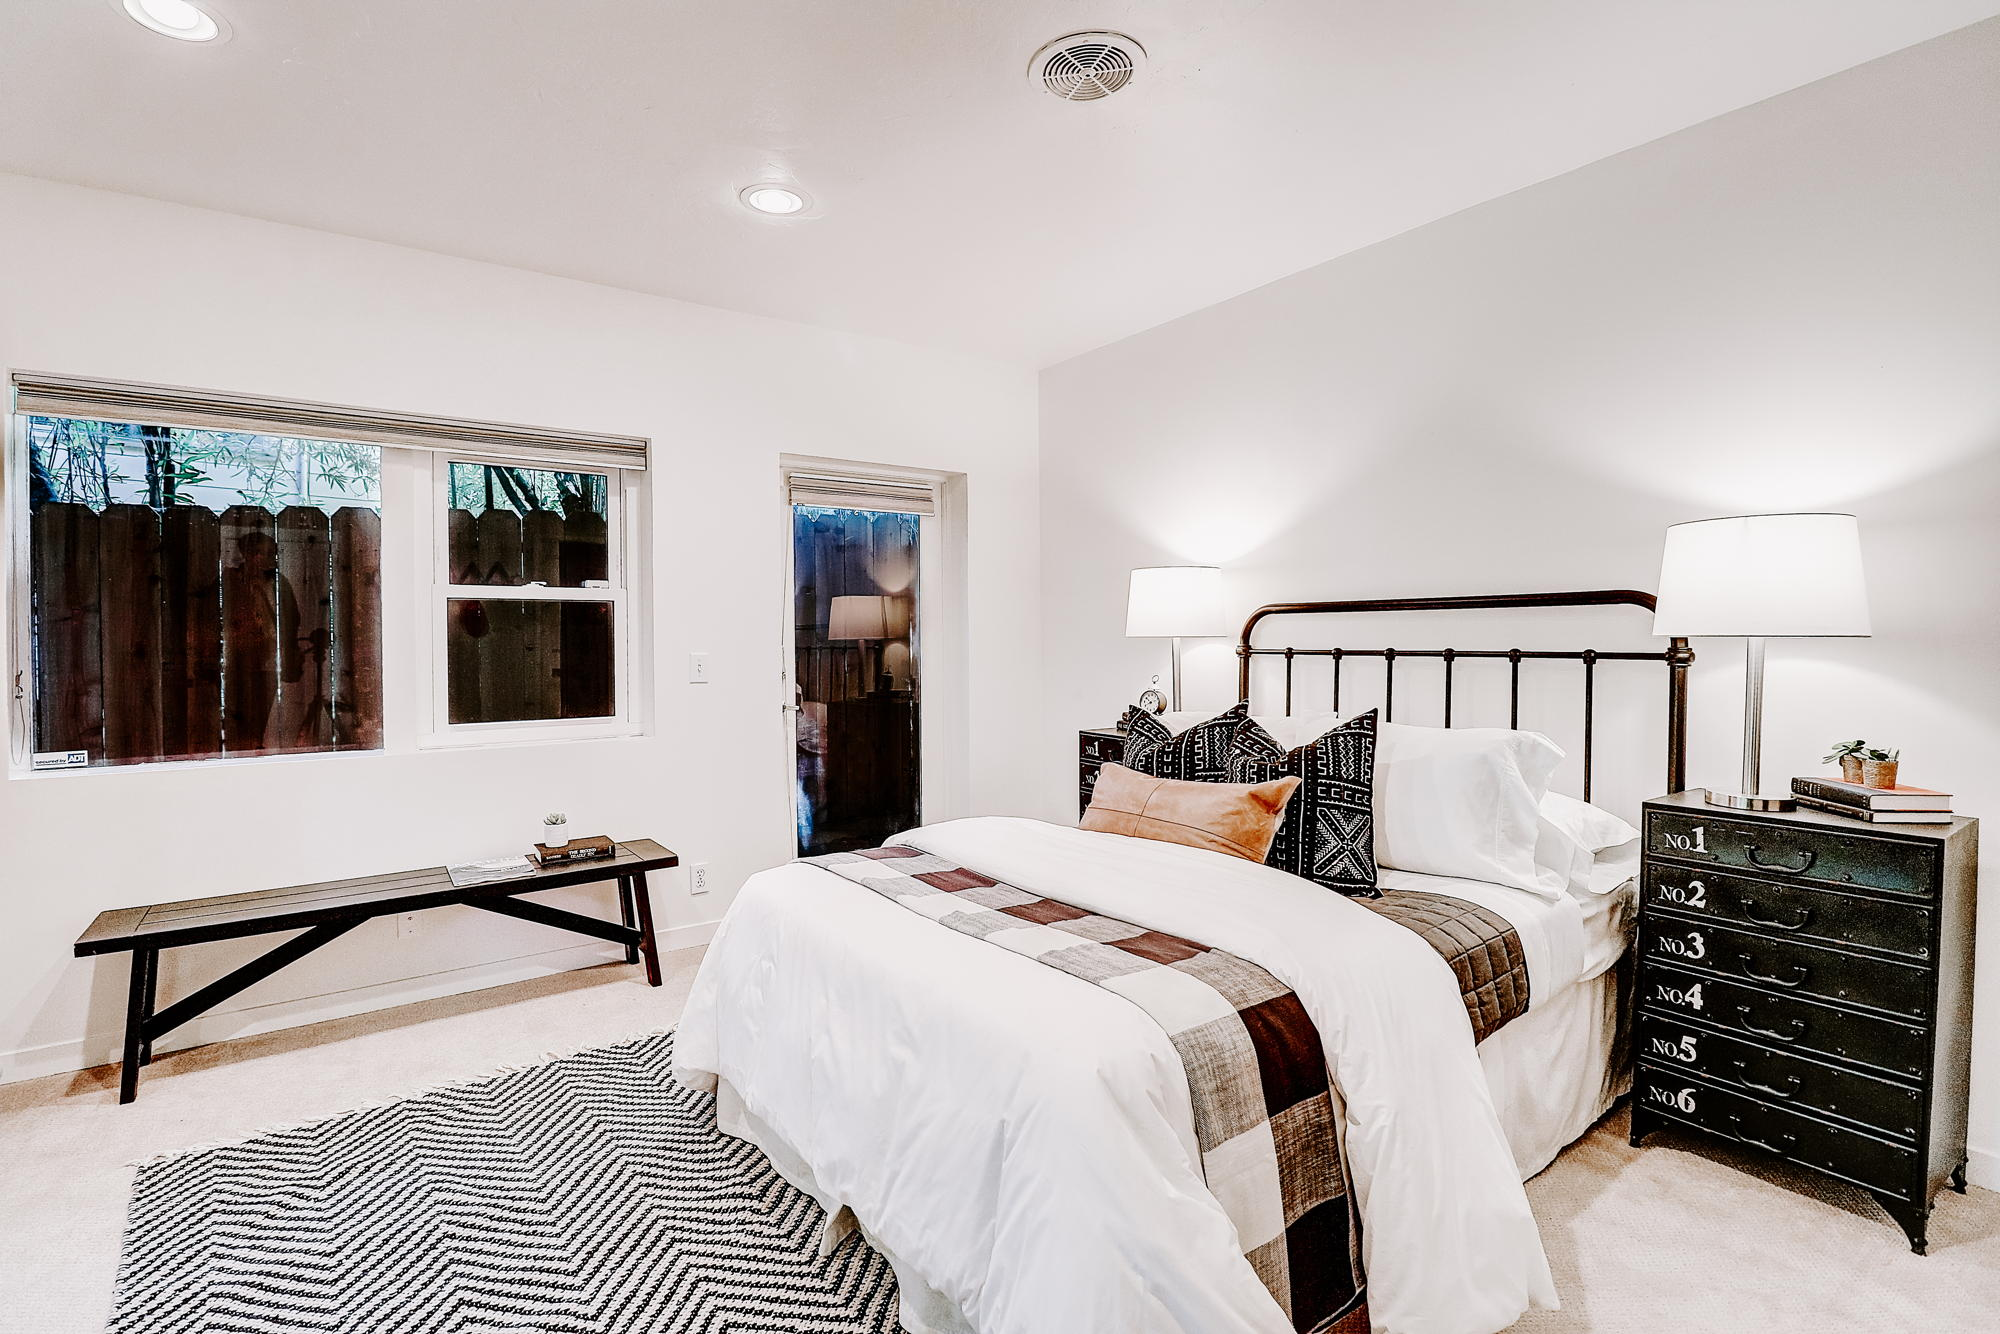 360 Corte Madera Avenue,  Marin County Top Realtor -49- Own Marin at Compass.jpg